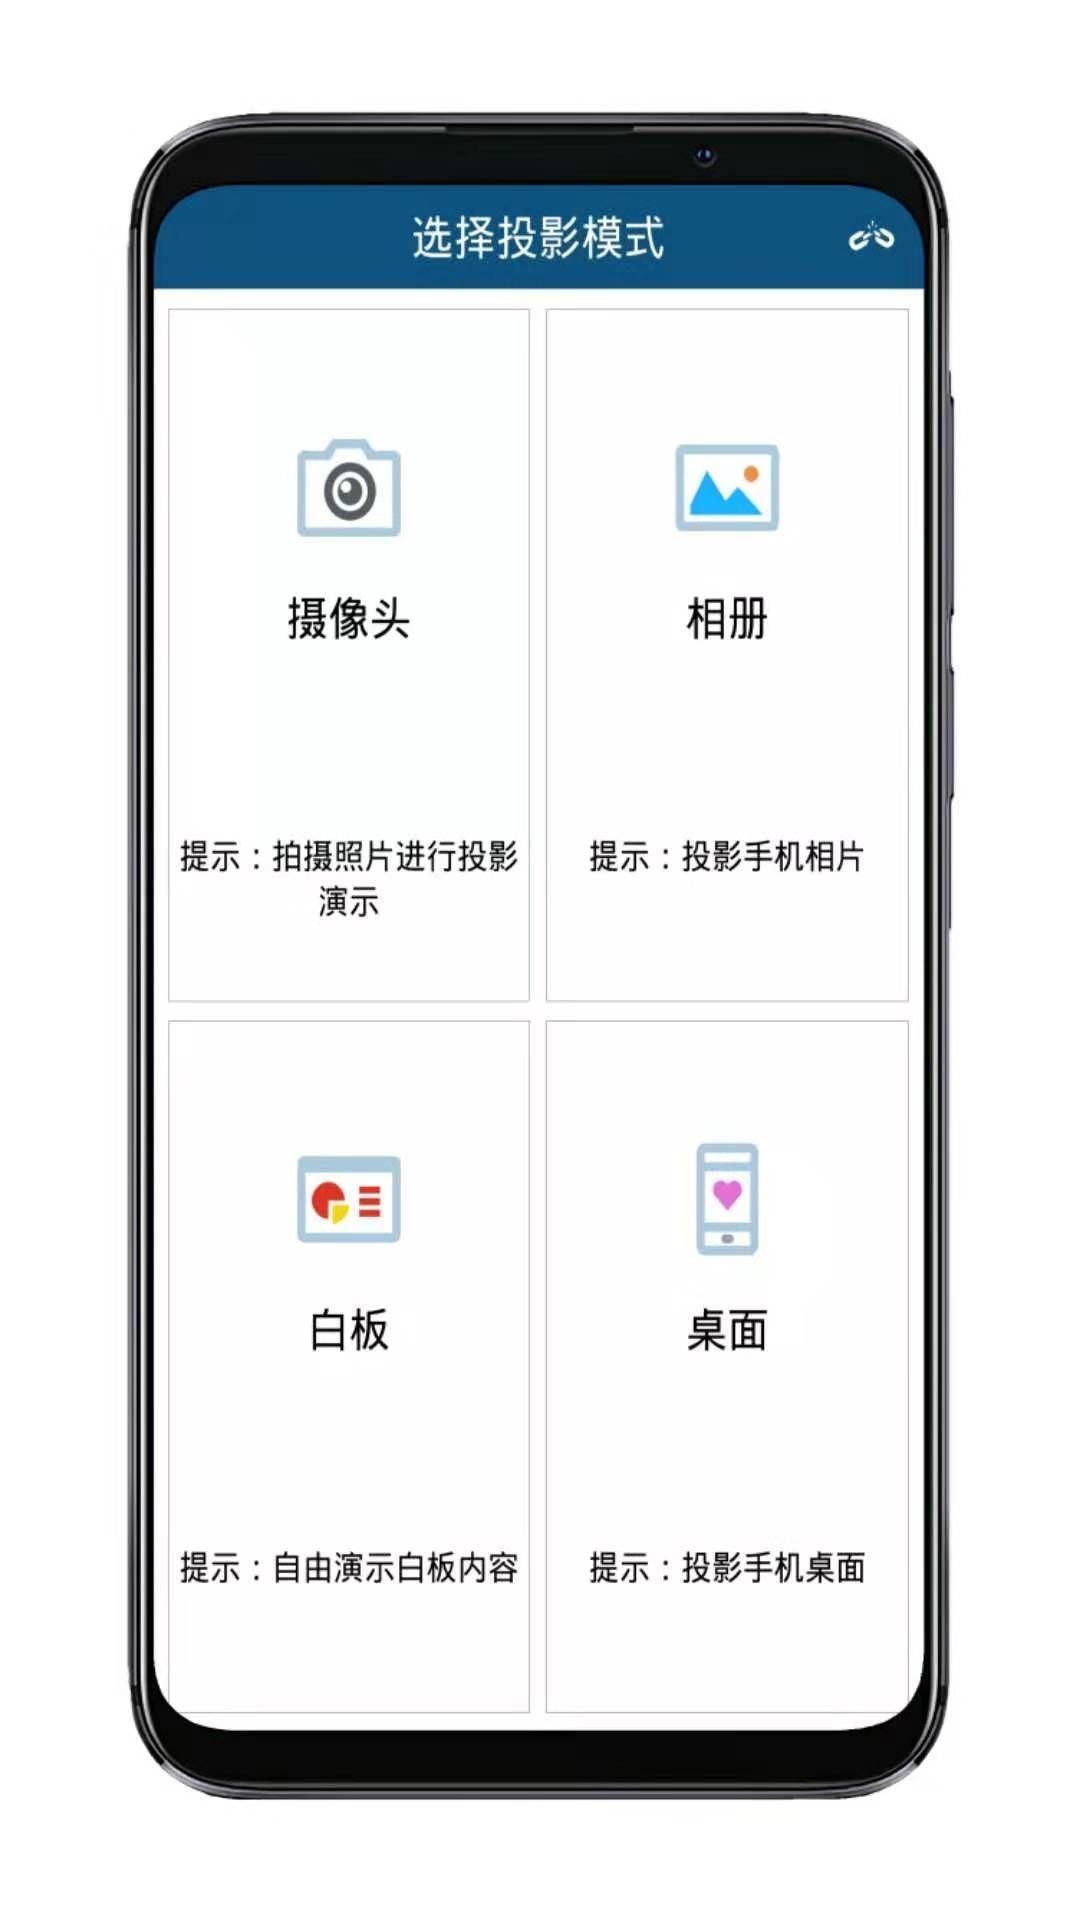 60e822055132923bf8be80a3 可以实现手机(Android、ios均支持),电脑、电视 之间相互投影--一键投影